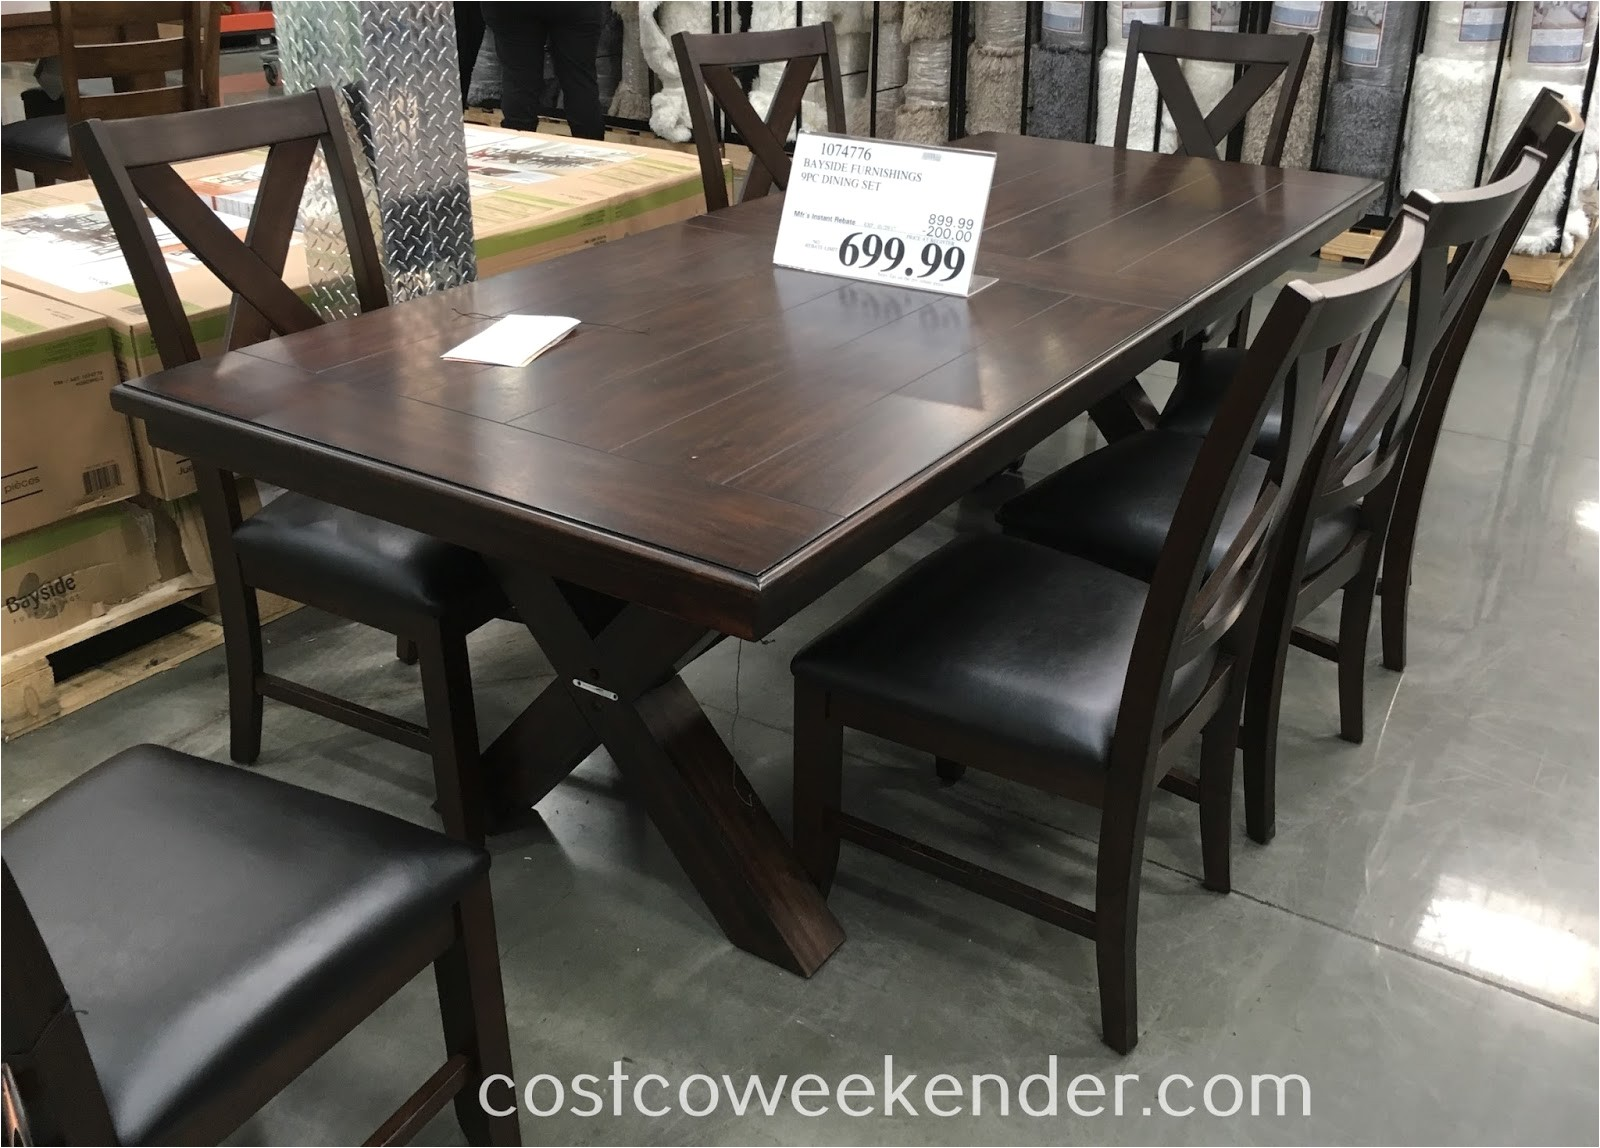 bayside furnishings 9 piece dining set costco 1074776